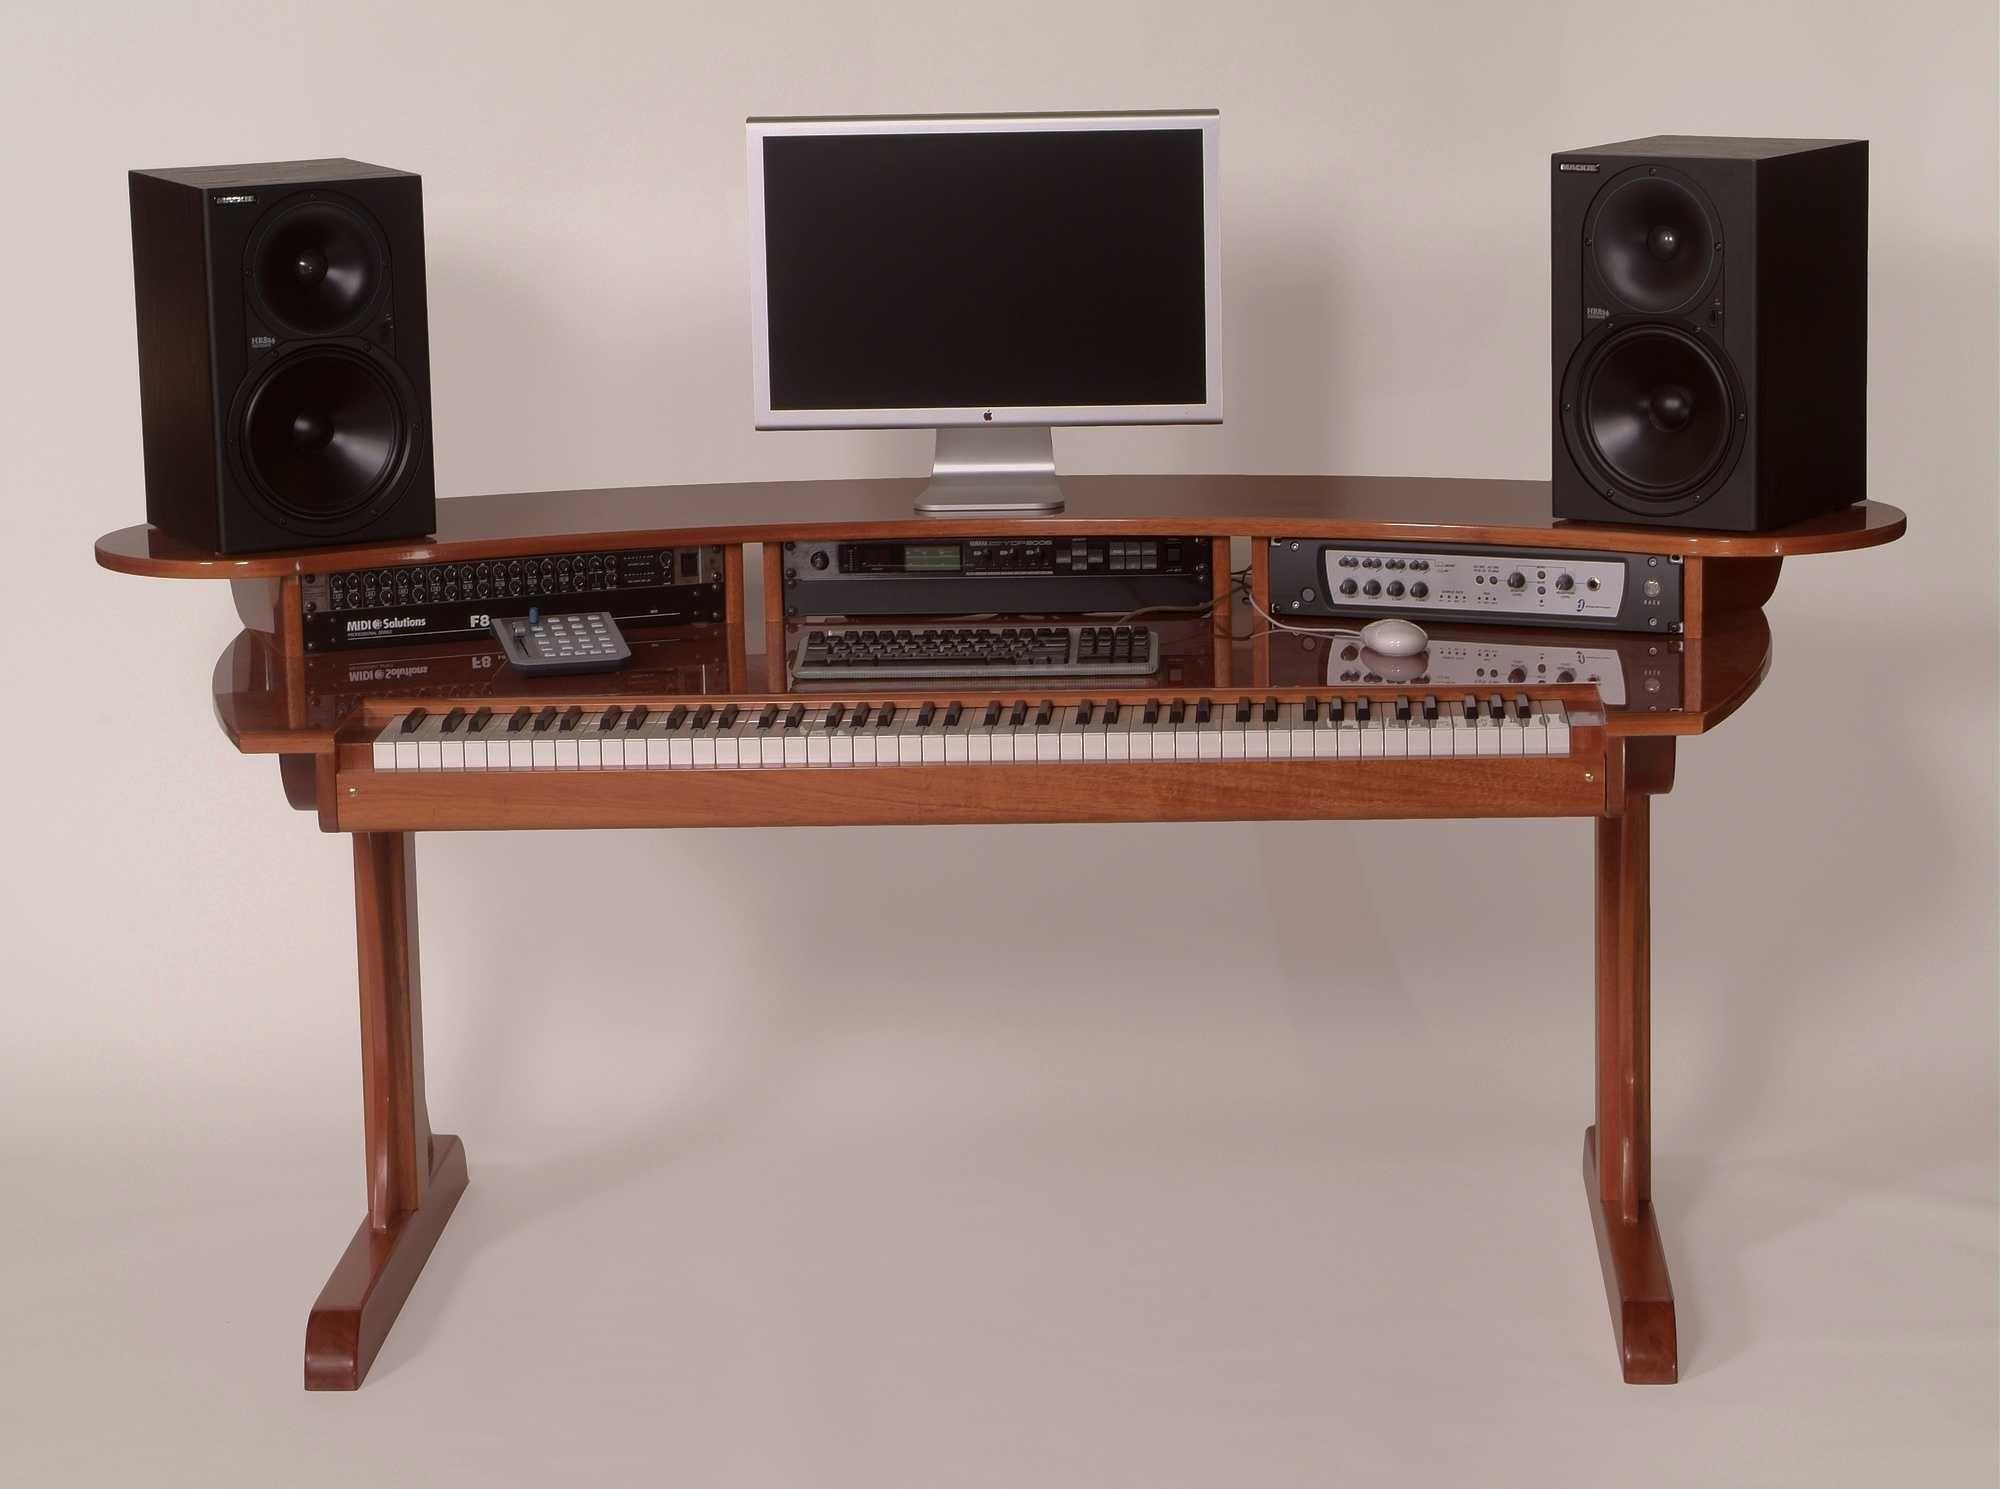 keyboard desk klavier studio und buero. Black Bedroom Furniture Sets. Home Design Ideas